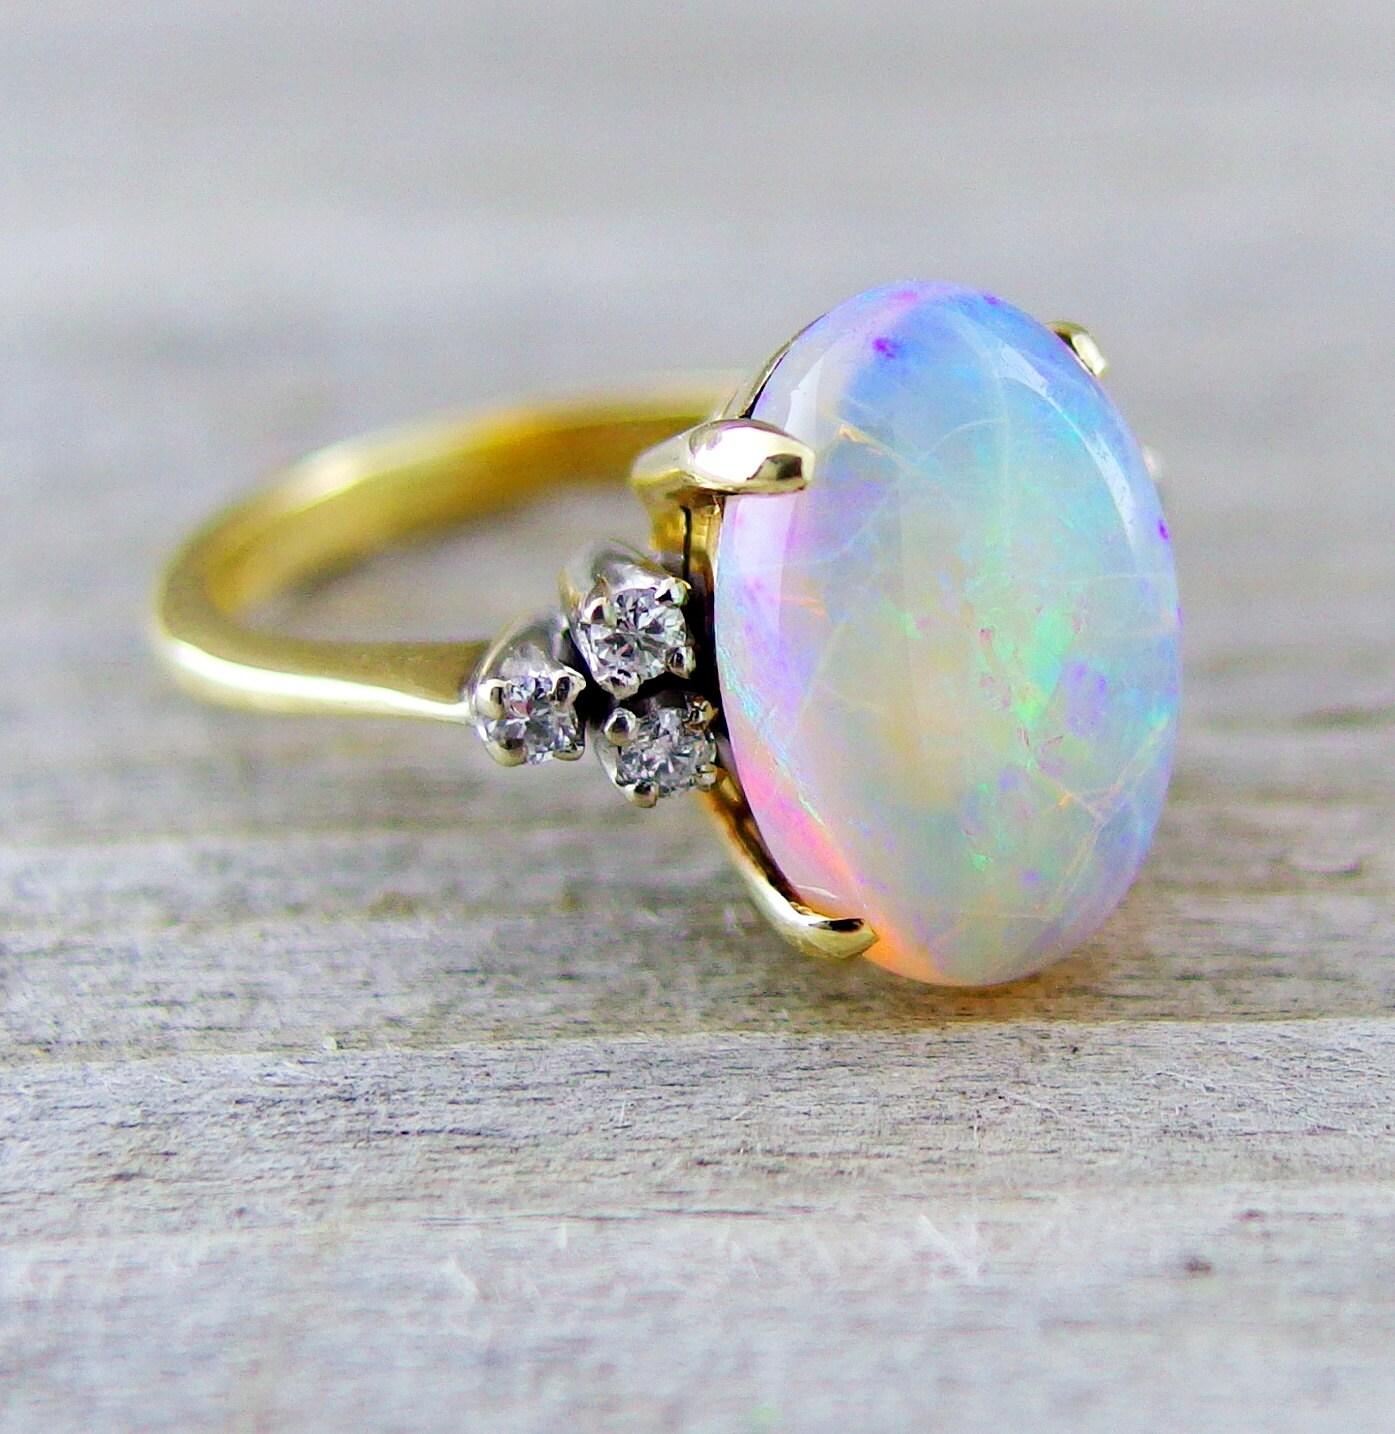 Vintage 3 12 Carat Opal And Diamond Engagement Anniversary